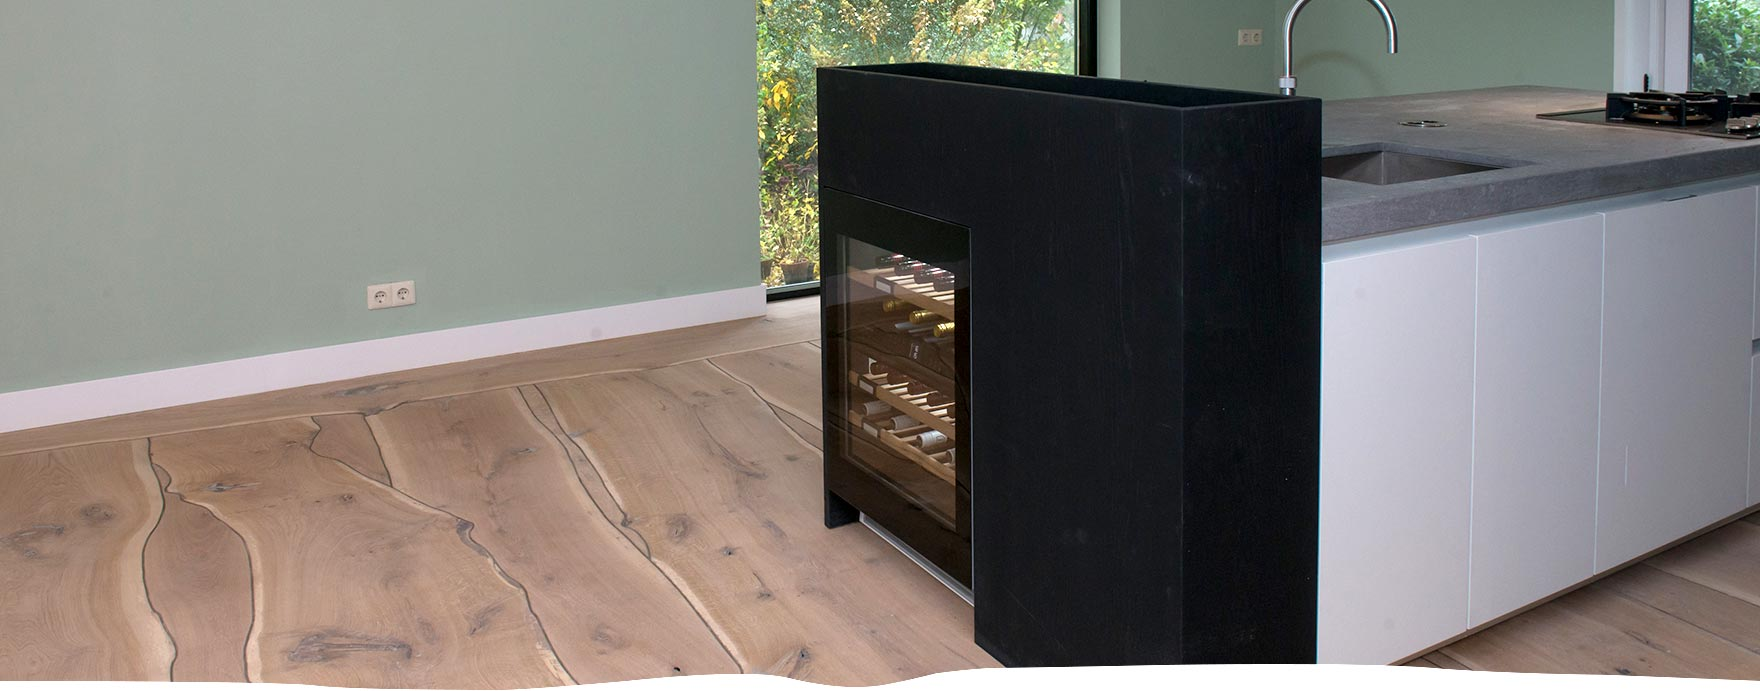 Boomstamvloer op vloerverwarming - De Hout Snip